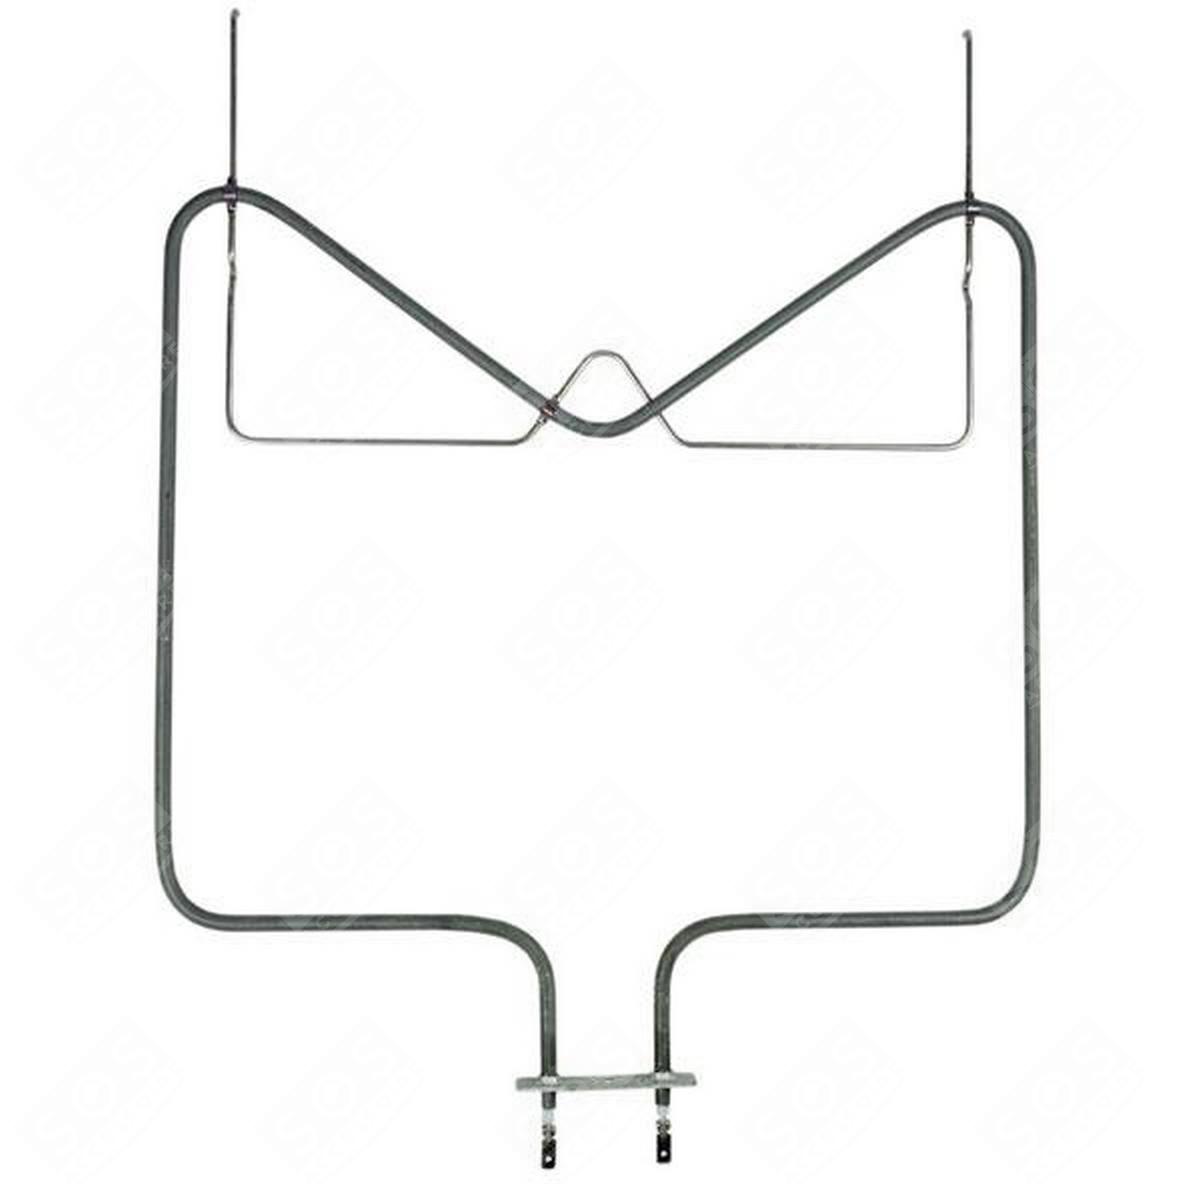 Bottom Oven Heating Element 1 150w Bauknecht Ignis Laden